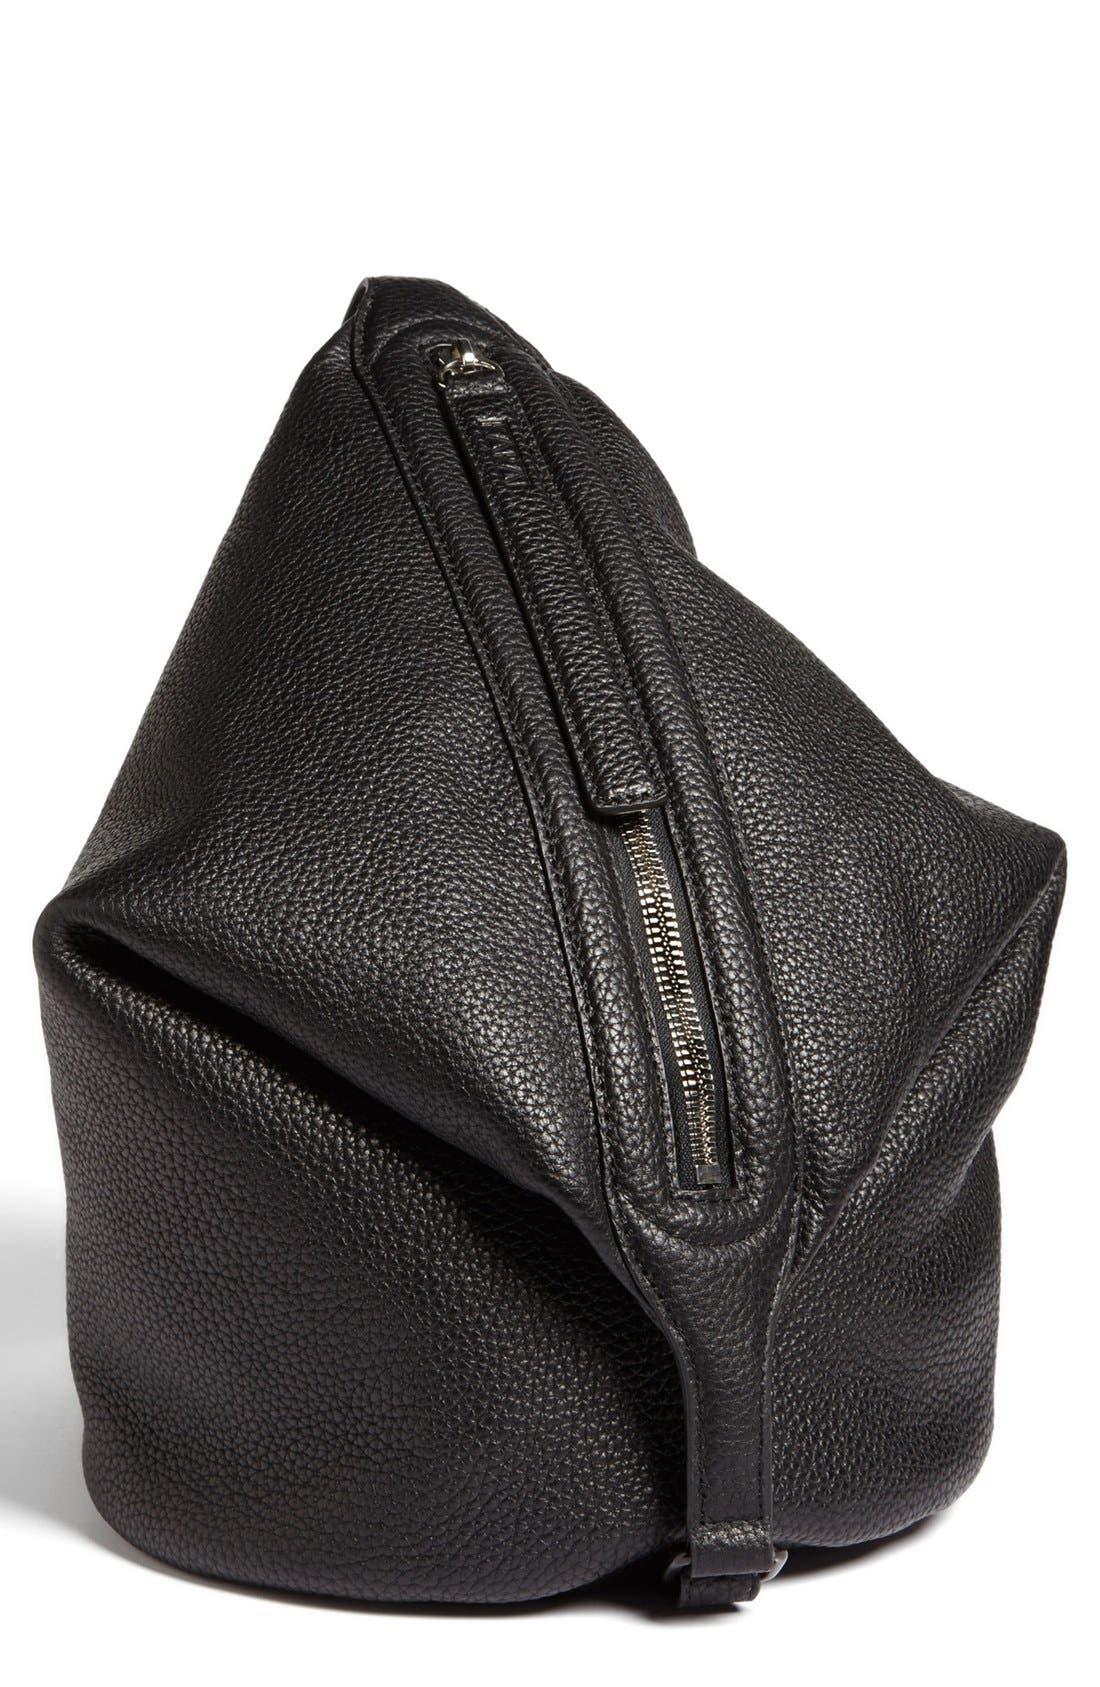 Alternate Image 2  - Kara 'Dry - Small' Convertible Pebbled Leather Bucket Bag, Small